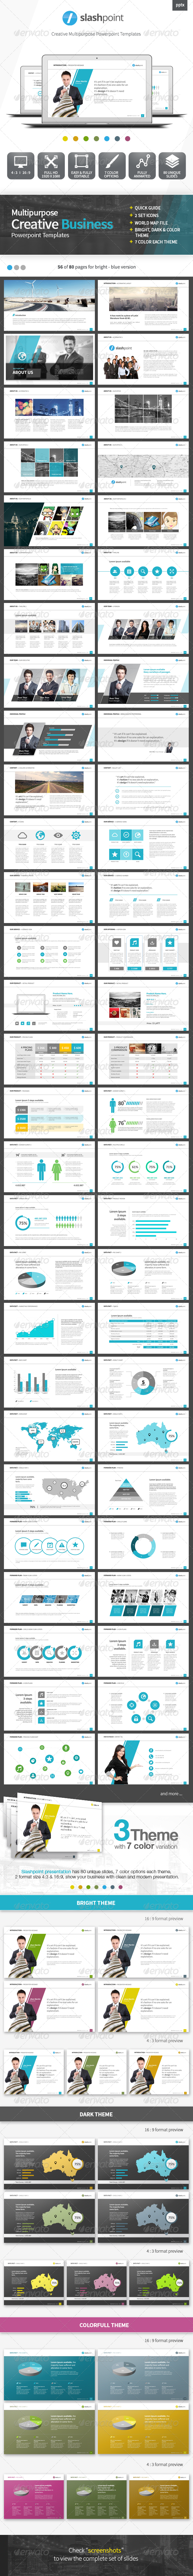 Slashpoint - Creative Business powerpoint template - PowerPoint Templates Presentation Templates